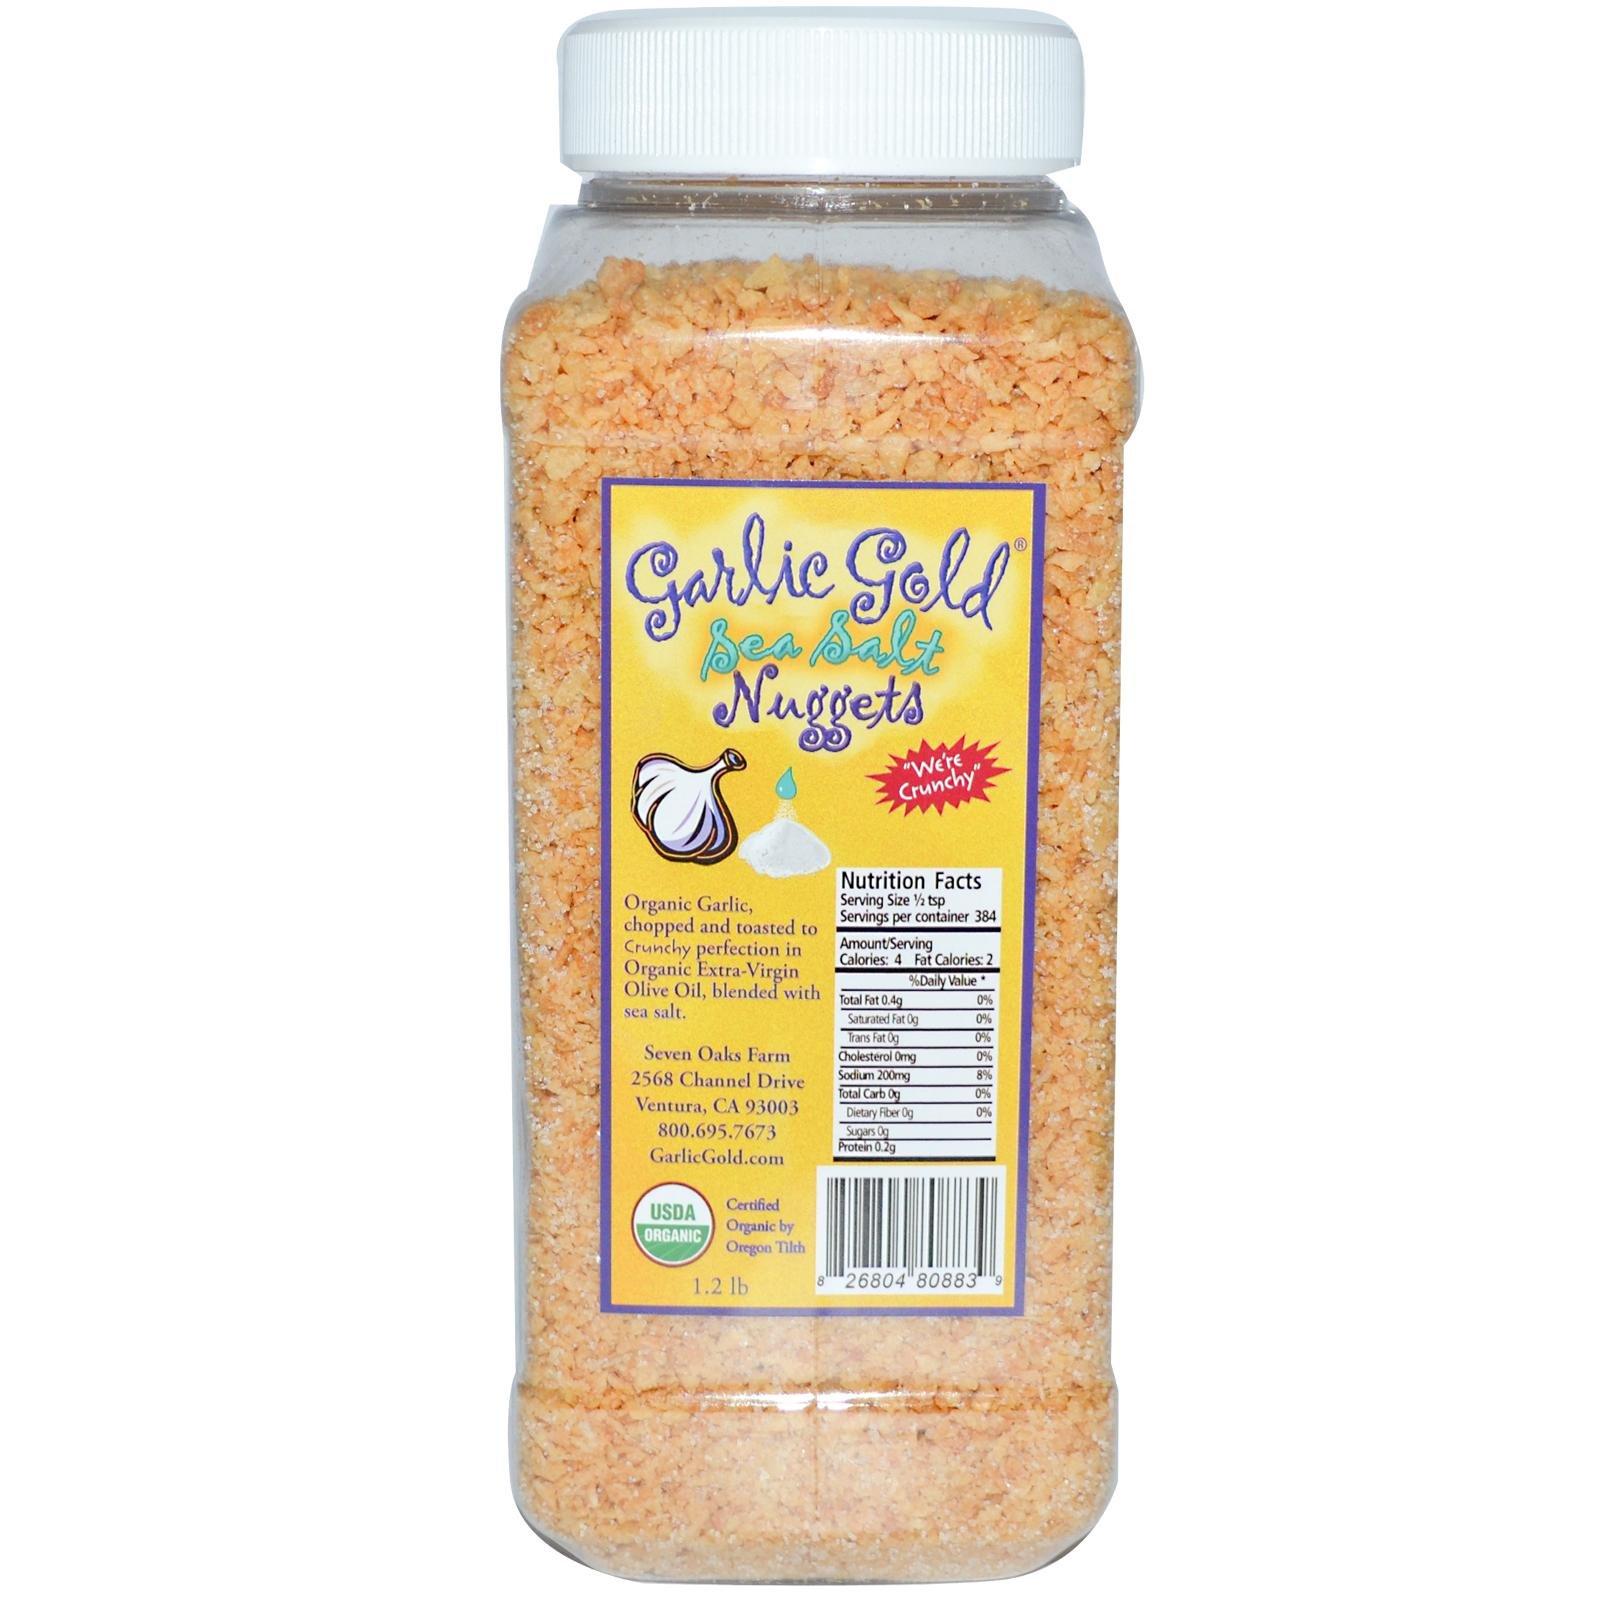 UDSA Organic Certified Garlic Gold, Garlic Nuggets with Sea Salt 1 Pound Container